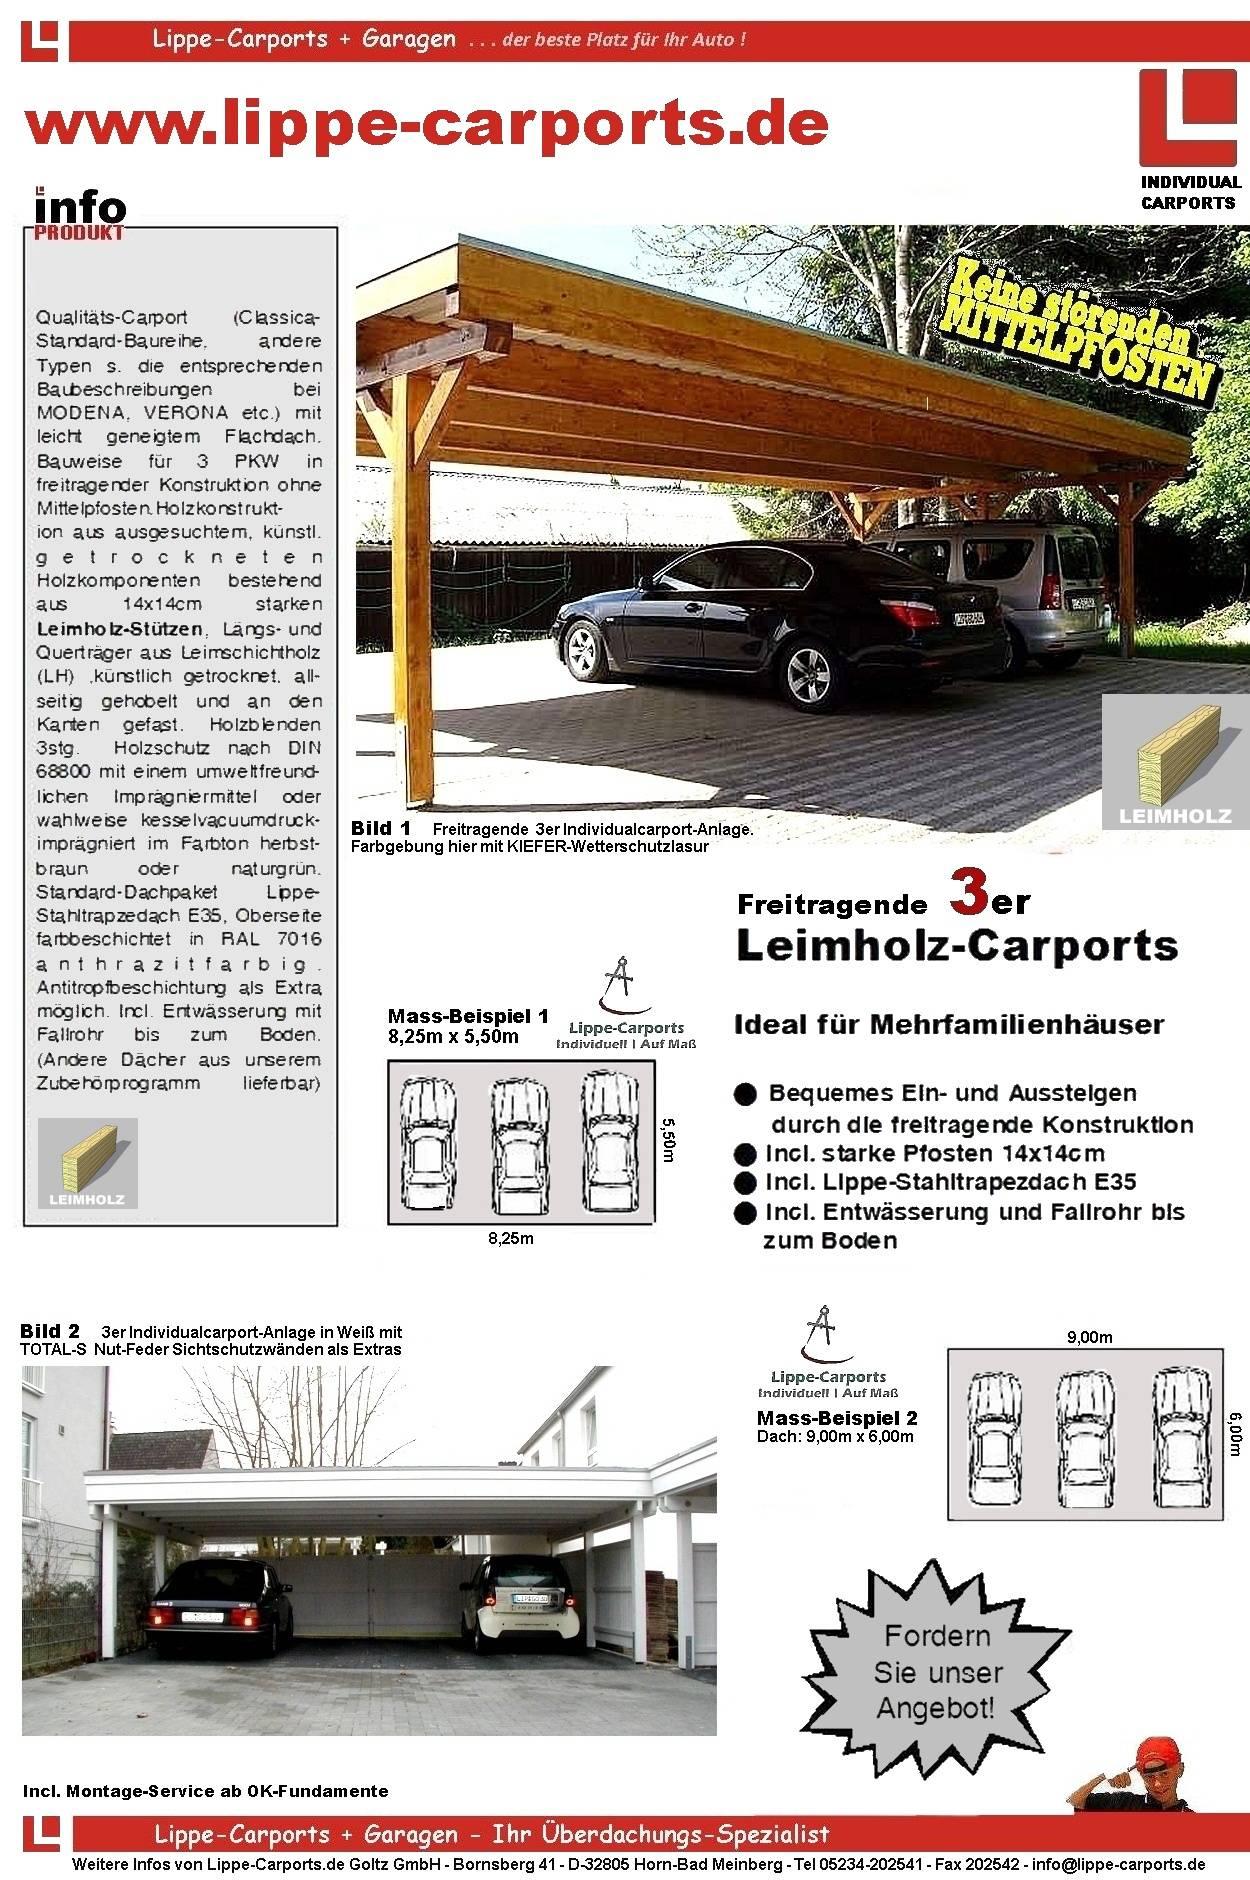 Dreiercarport Prospektblatt 1